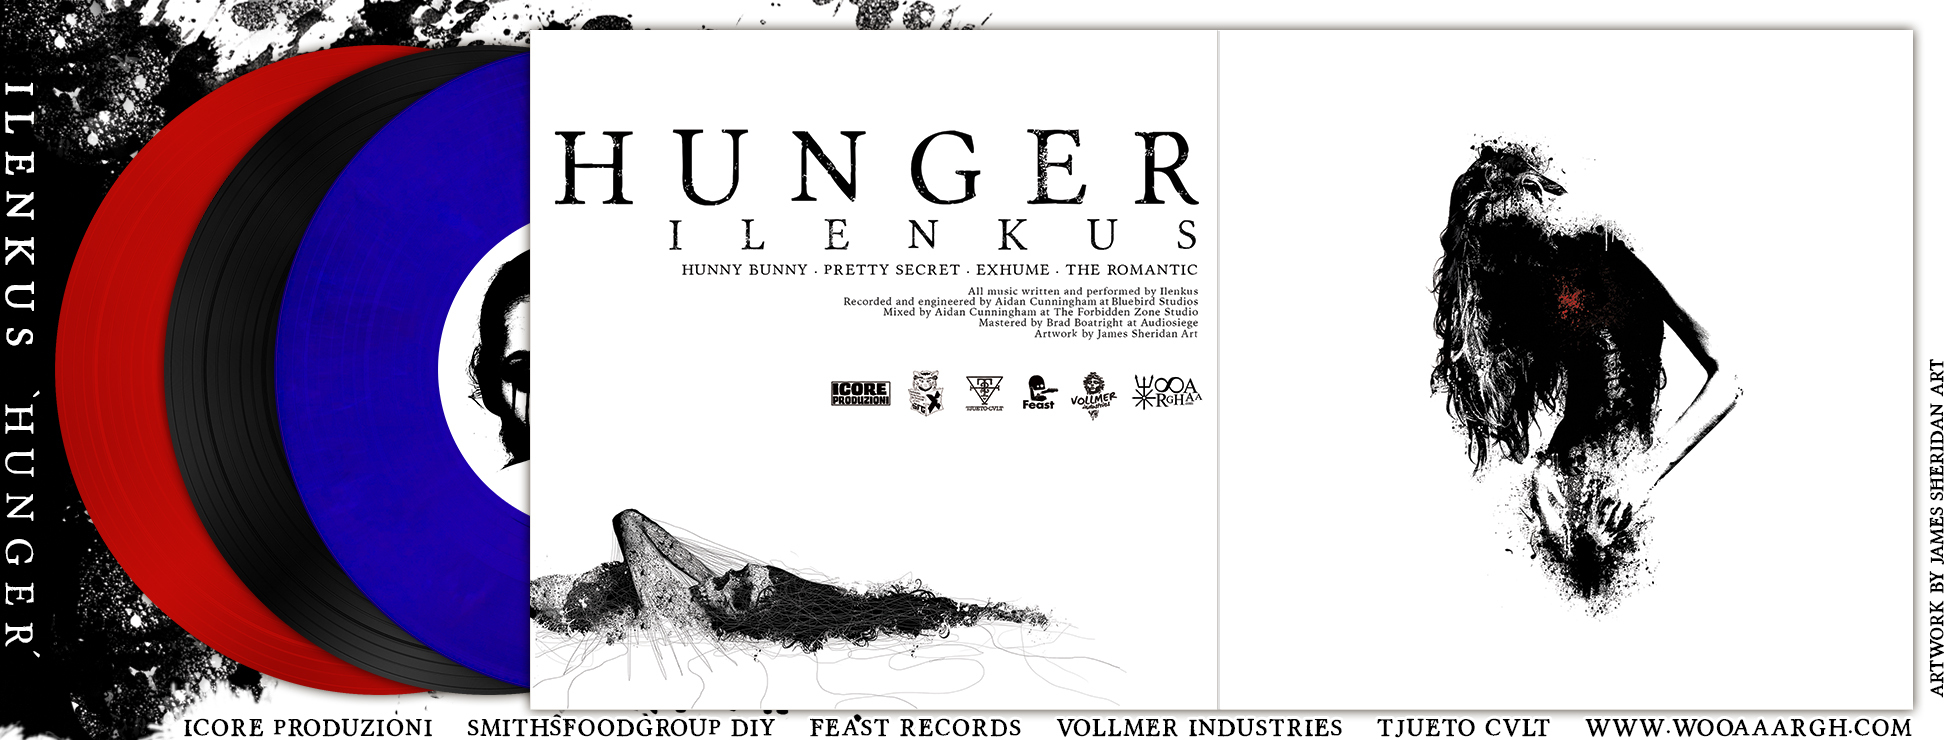 Ilenkus_banner